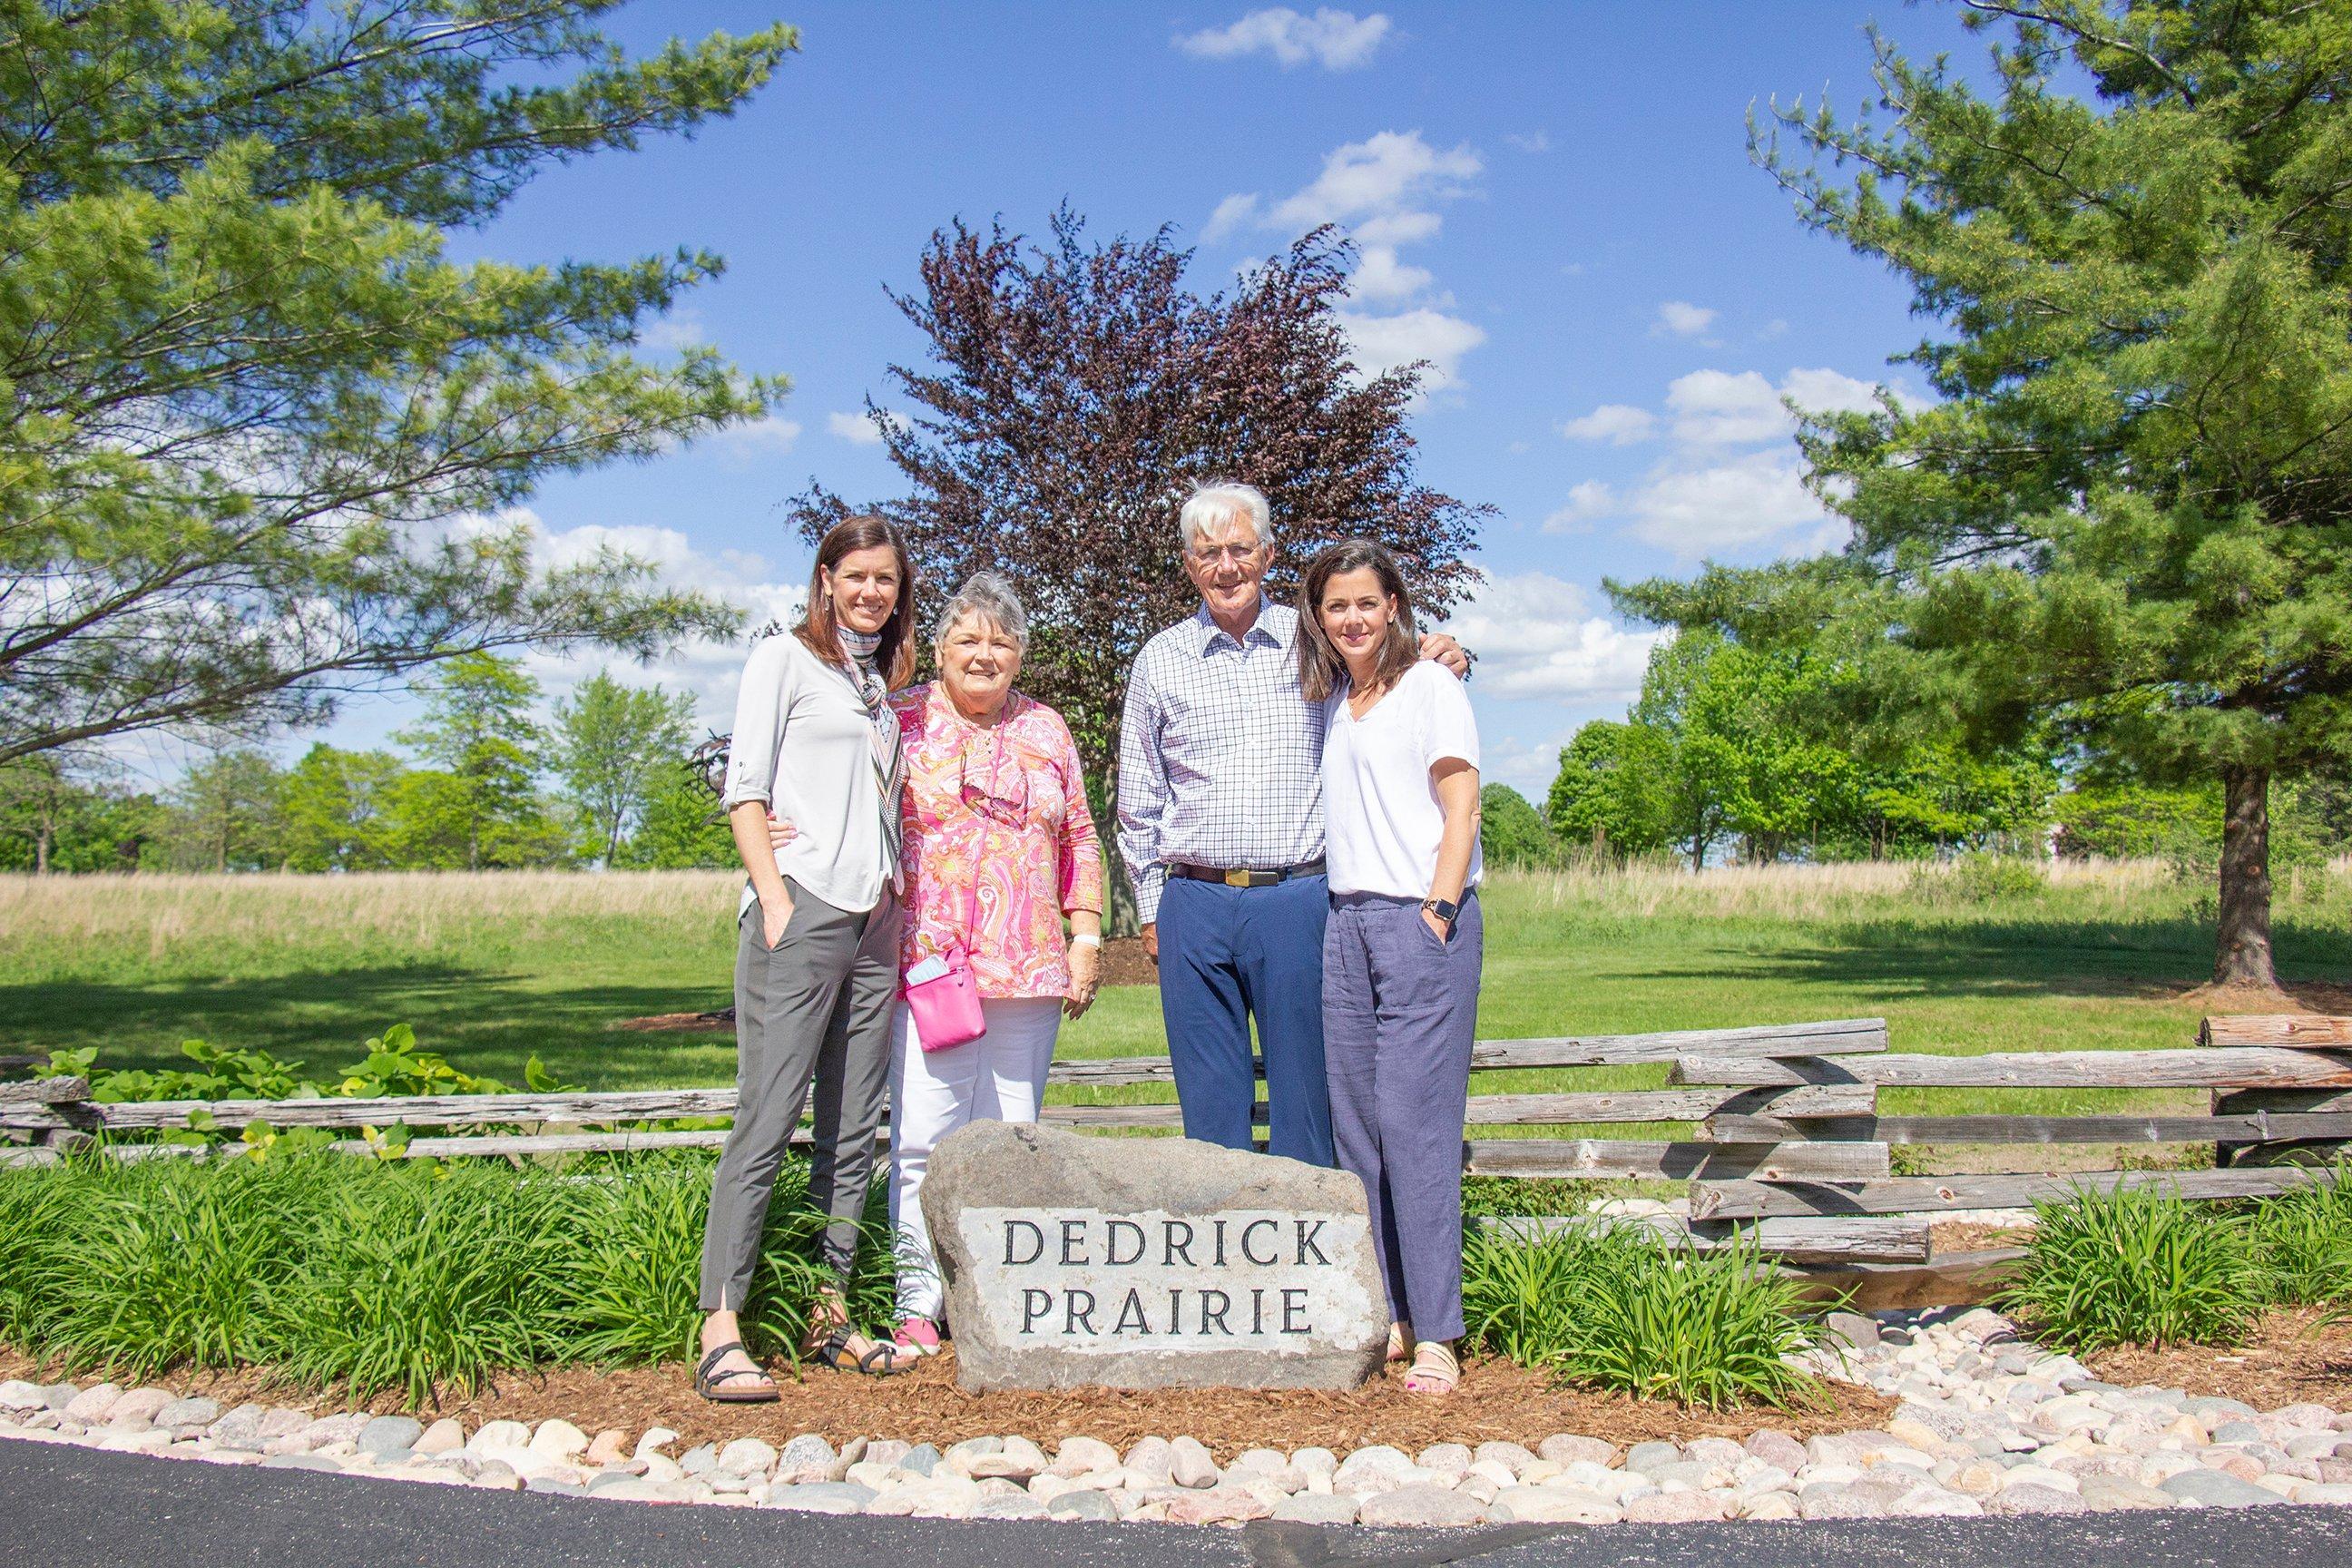 Dedrick family by Rock Plaque